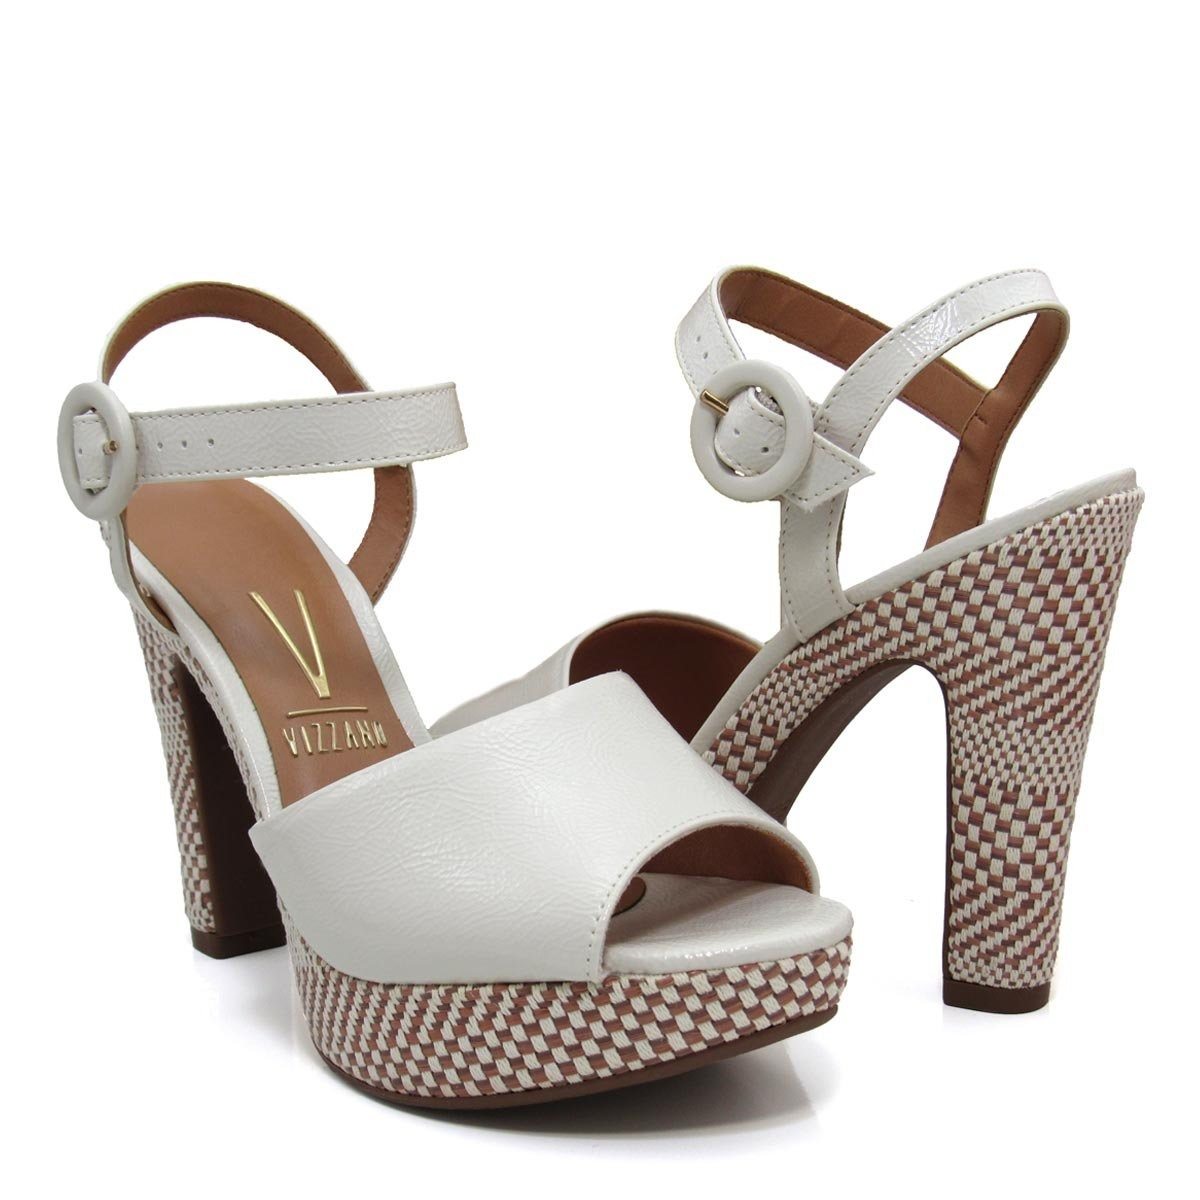 3b171c031 sandália feminina meia pata salto grosso vizzano 6292123. Carregando zoom.